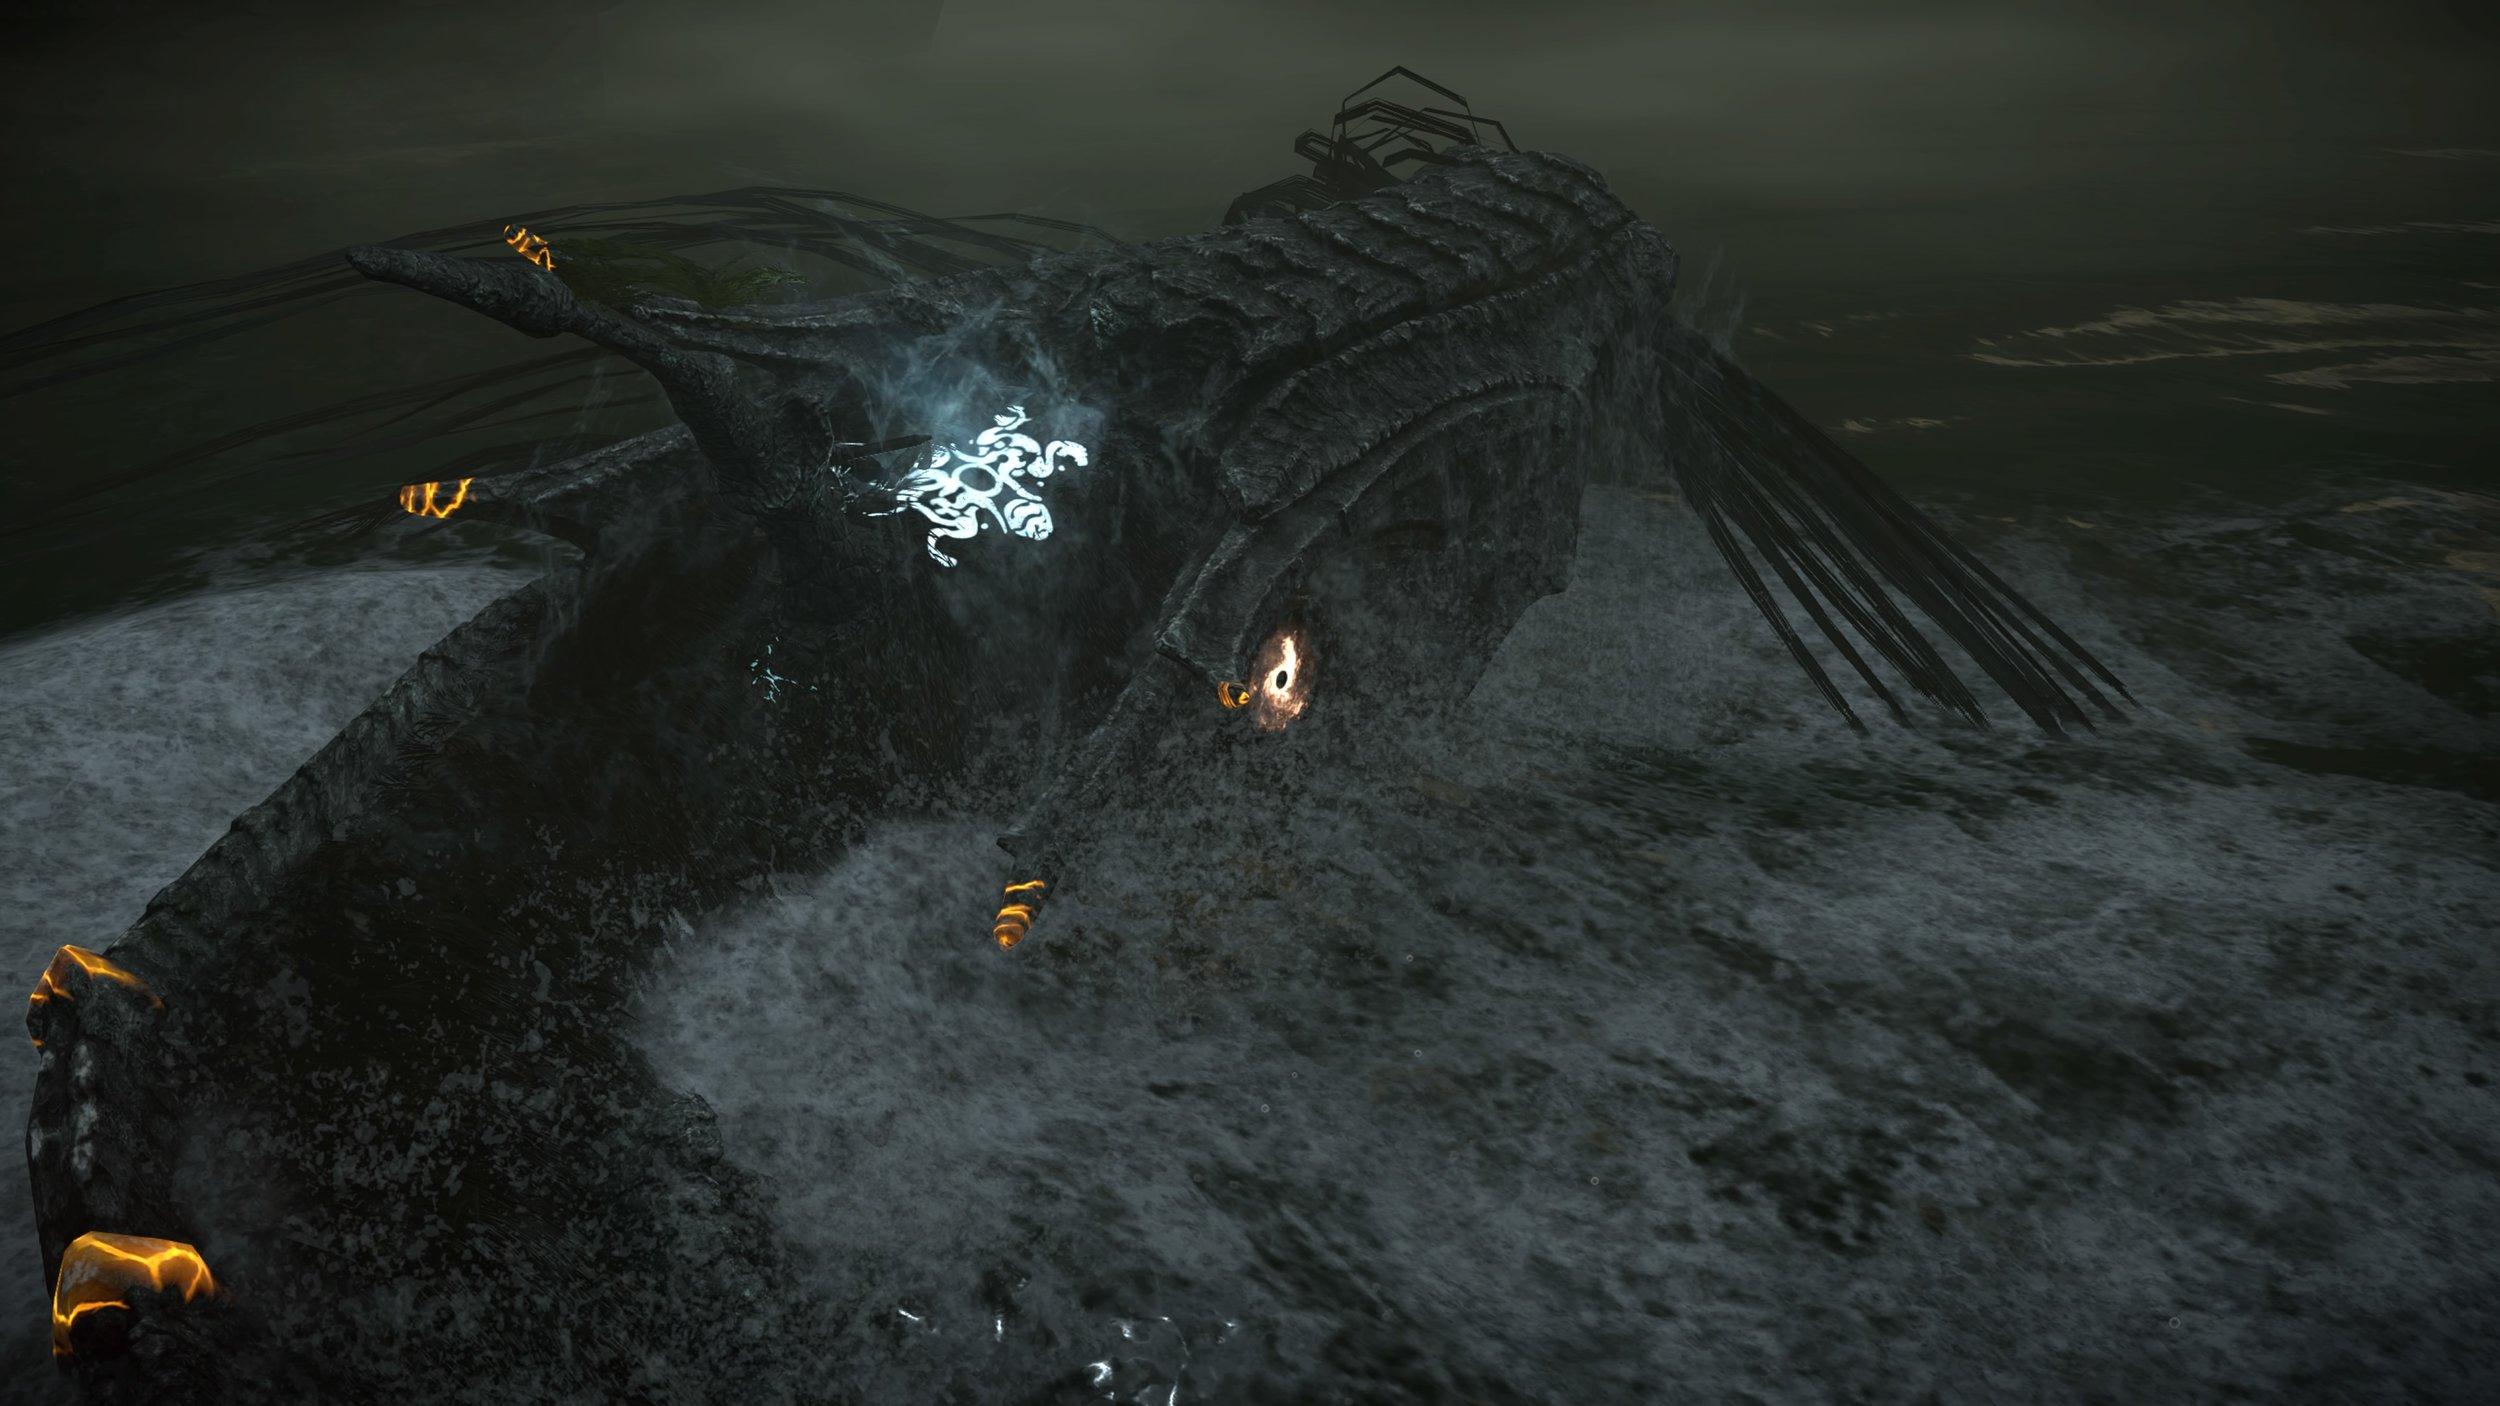 Colossus 7